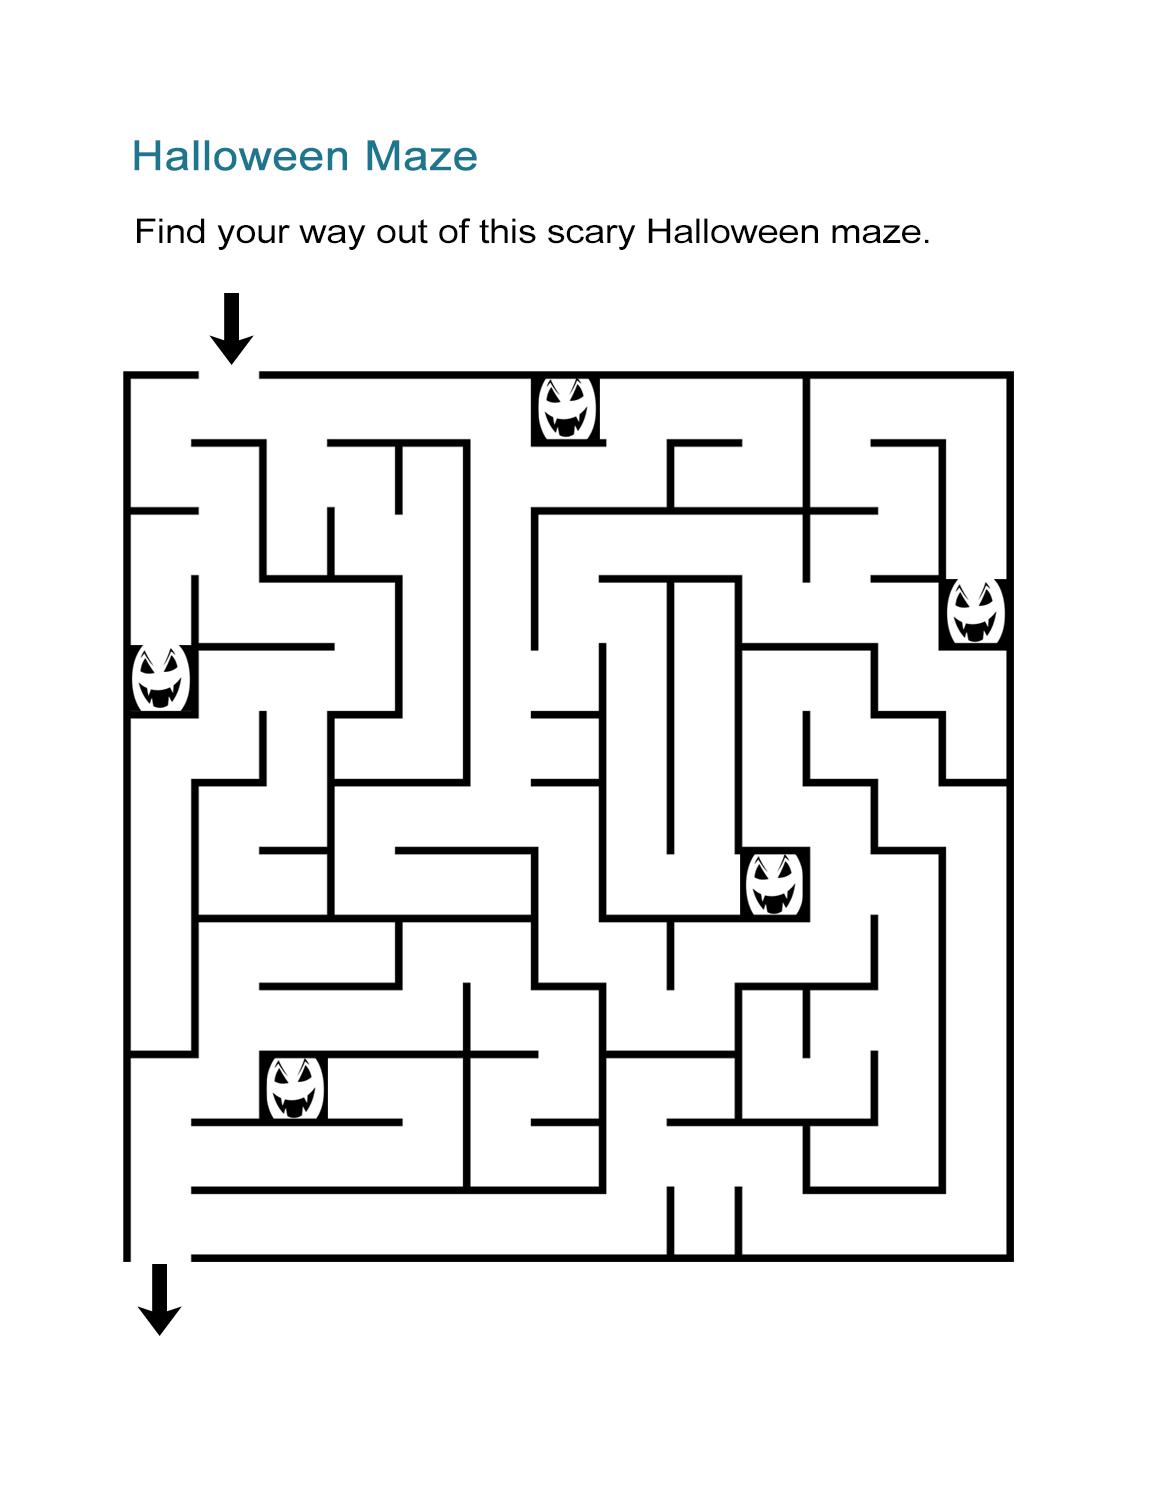 Halloween Maze Printable - All Esl